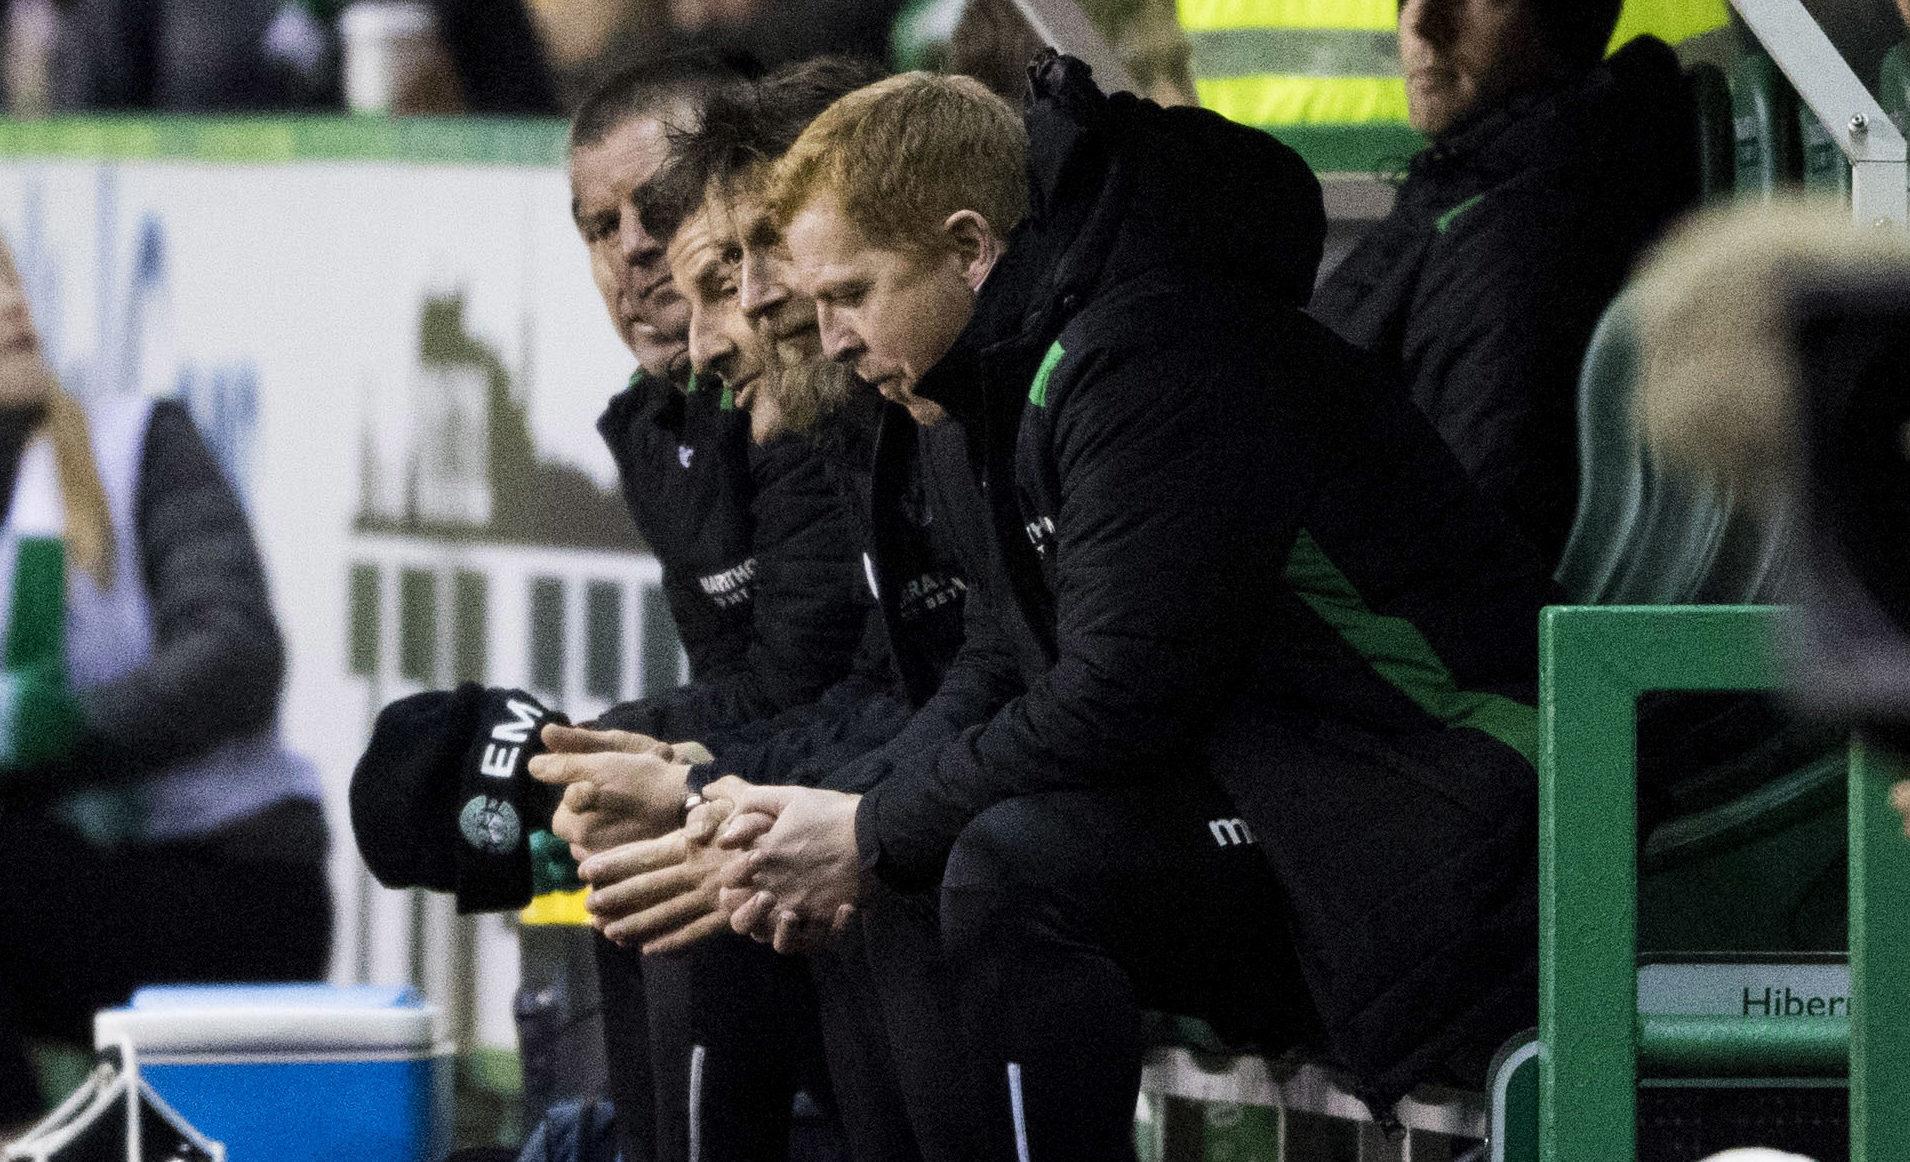 Hibernian manager Neil Lennon on the touchline at yesterday's Edinburgh derby (SNS Group)